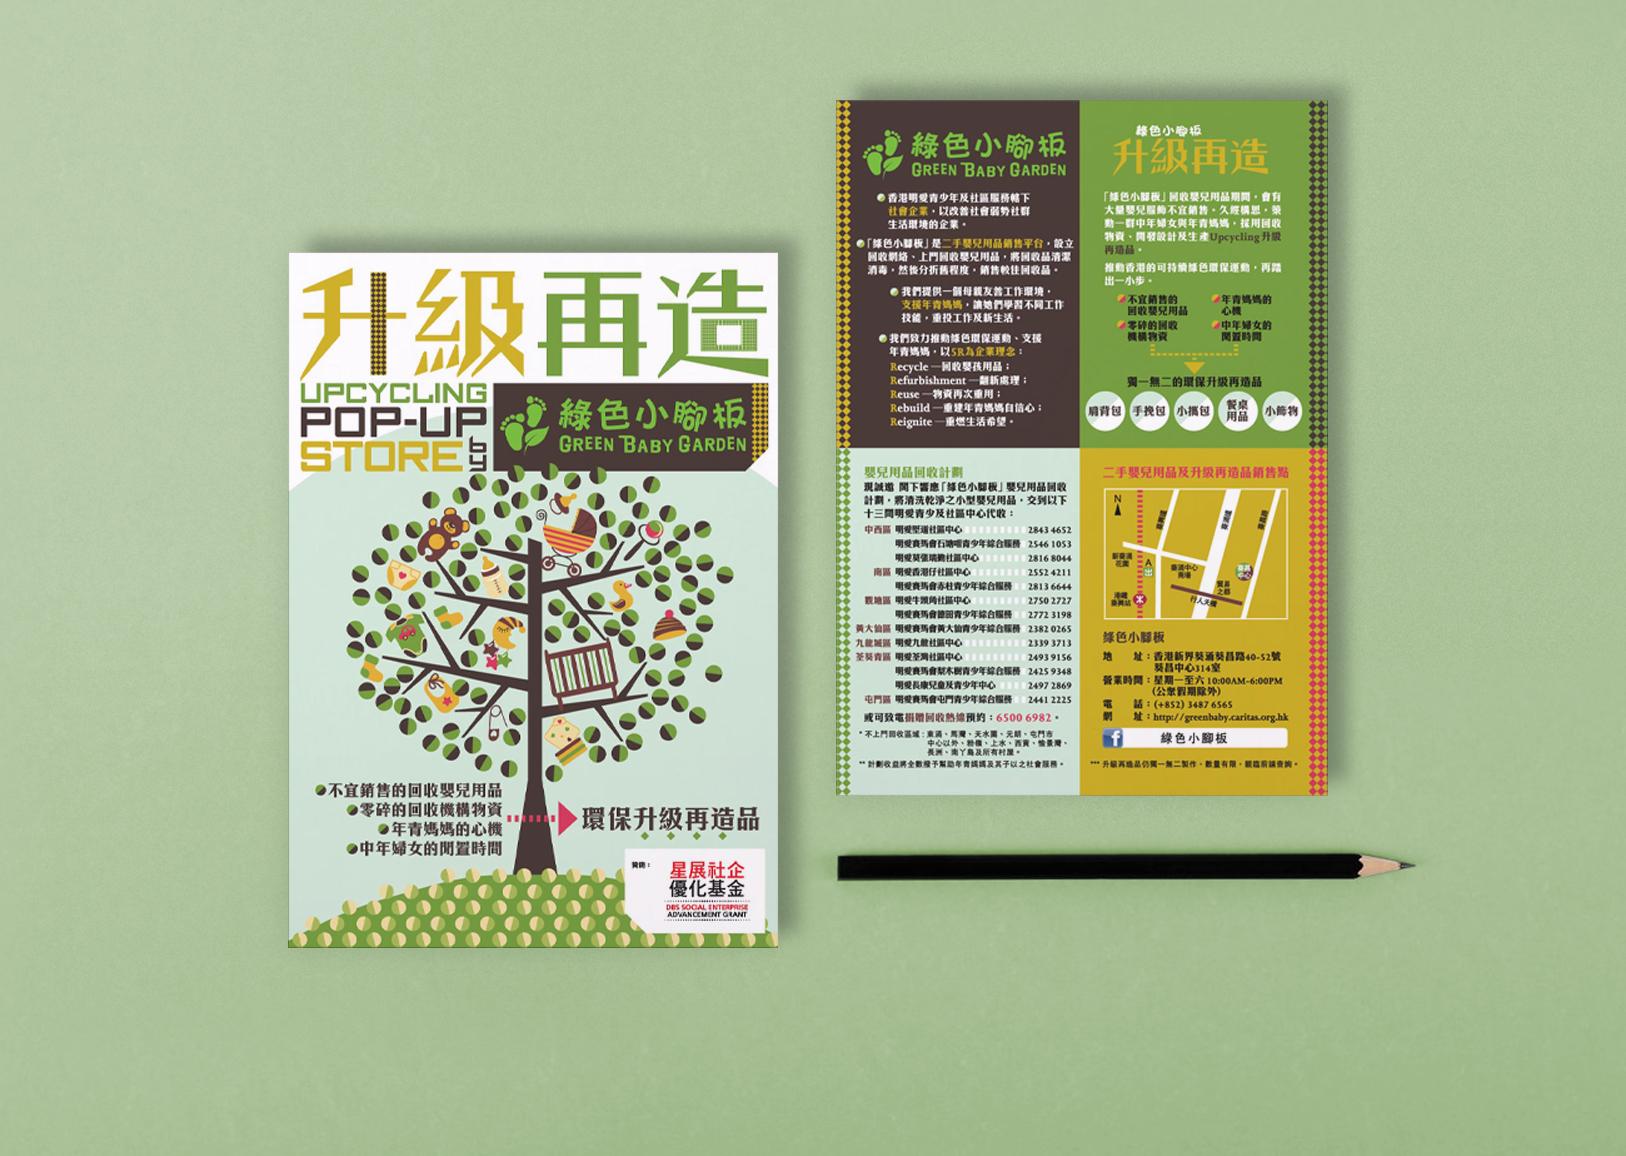 Green Baby Garden :: Second-hand Retail Platform :: Adhoc Leaflet Design front and back